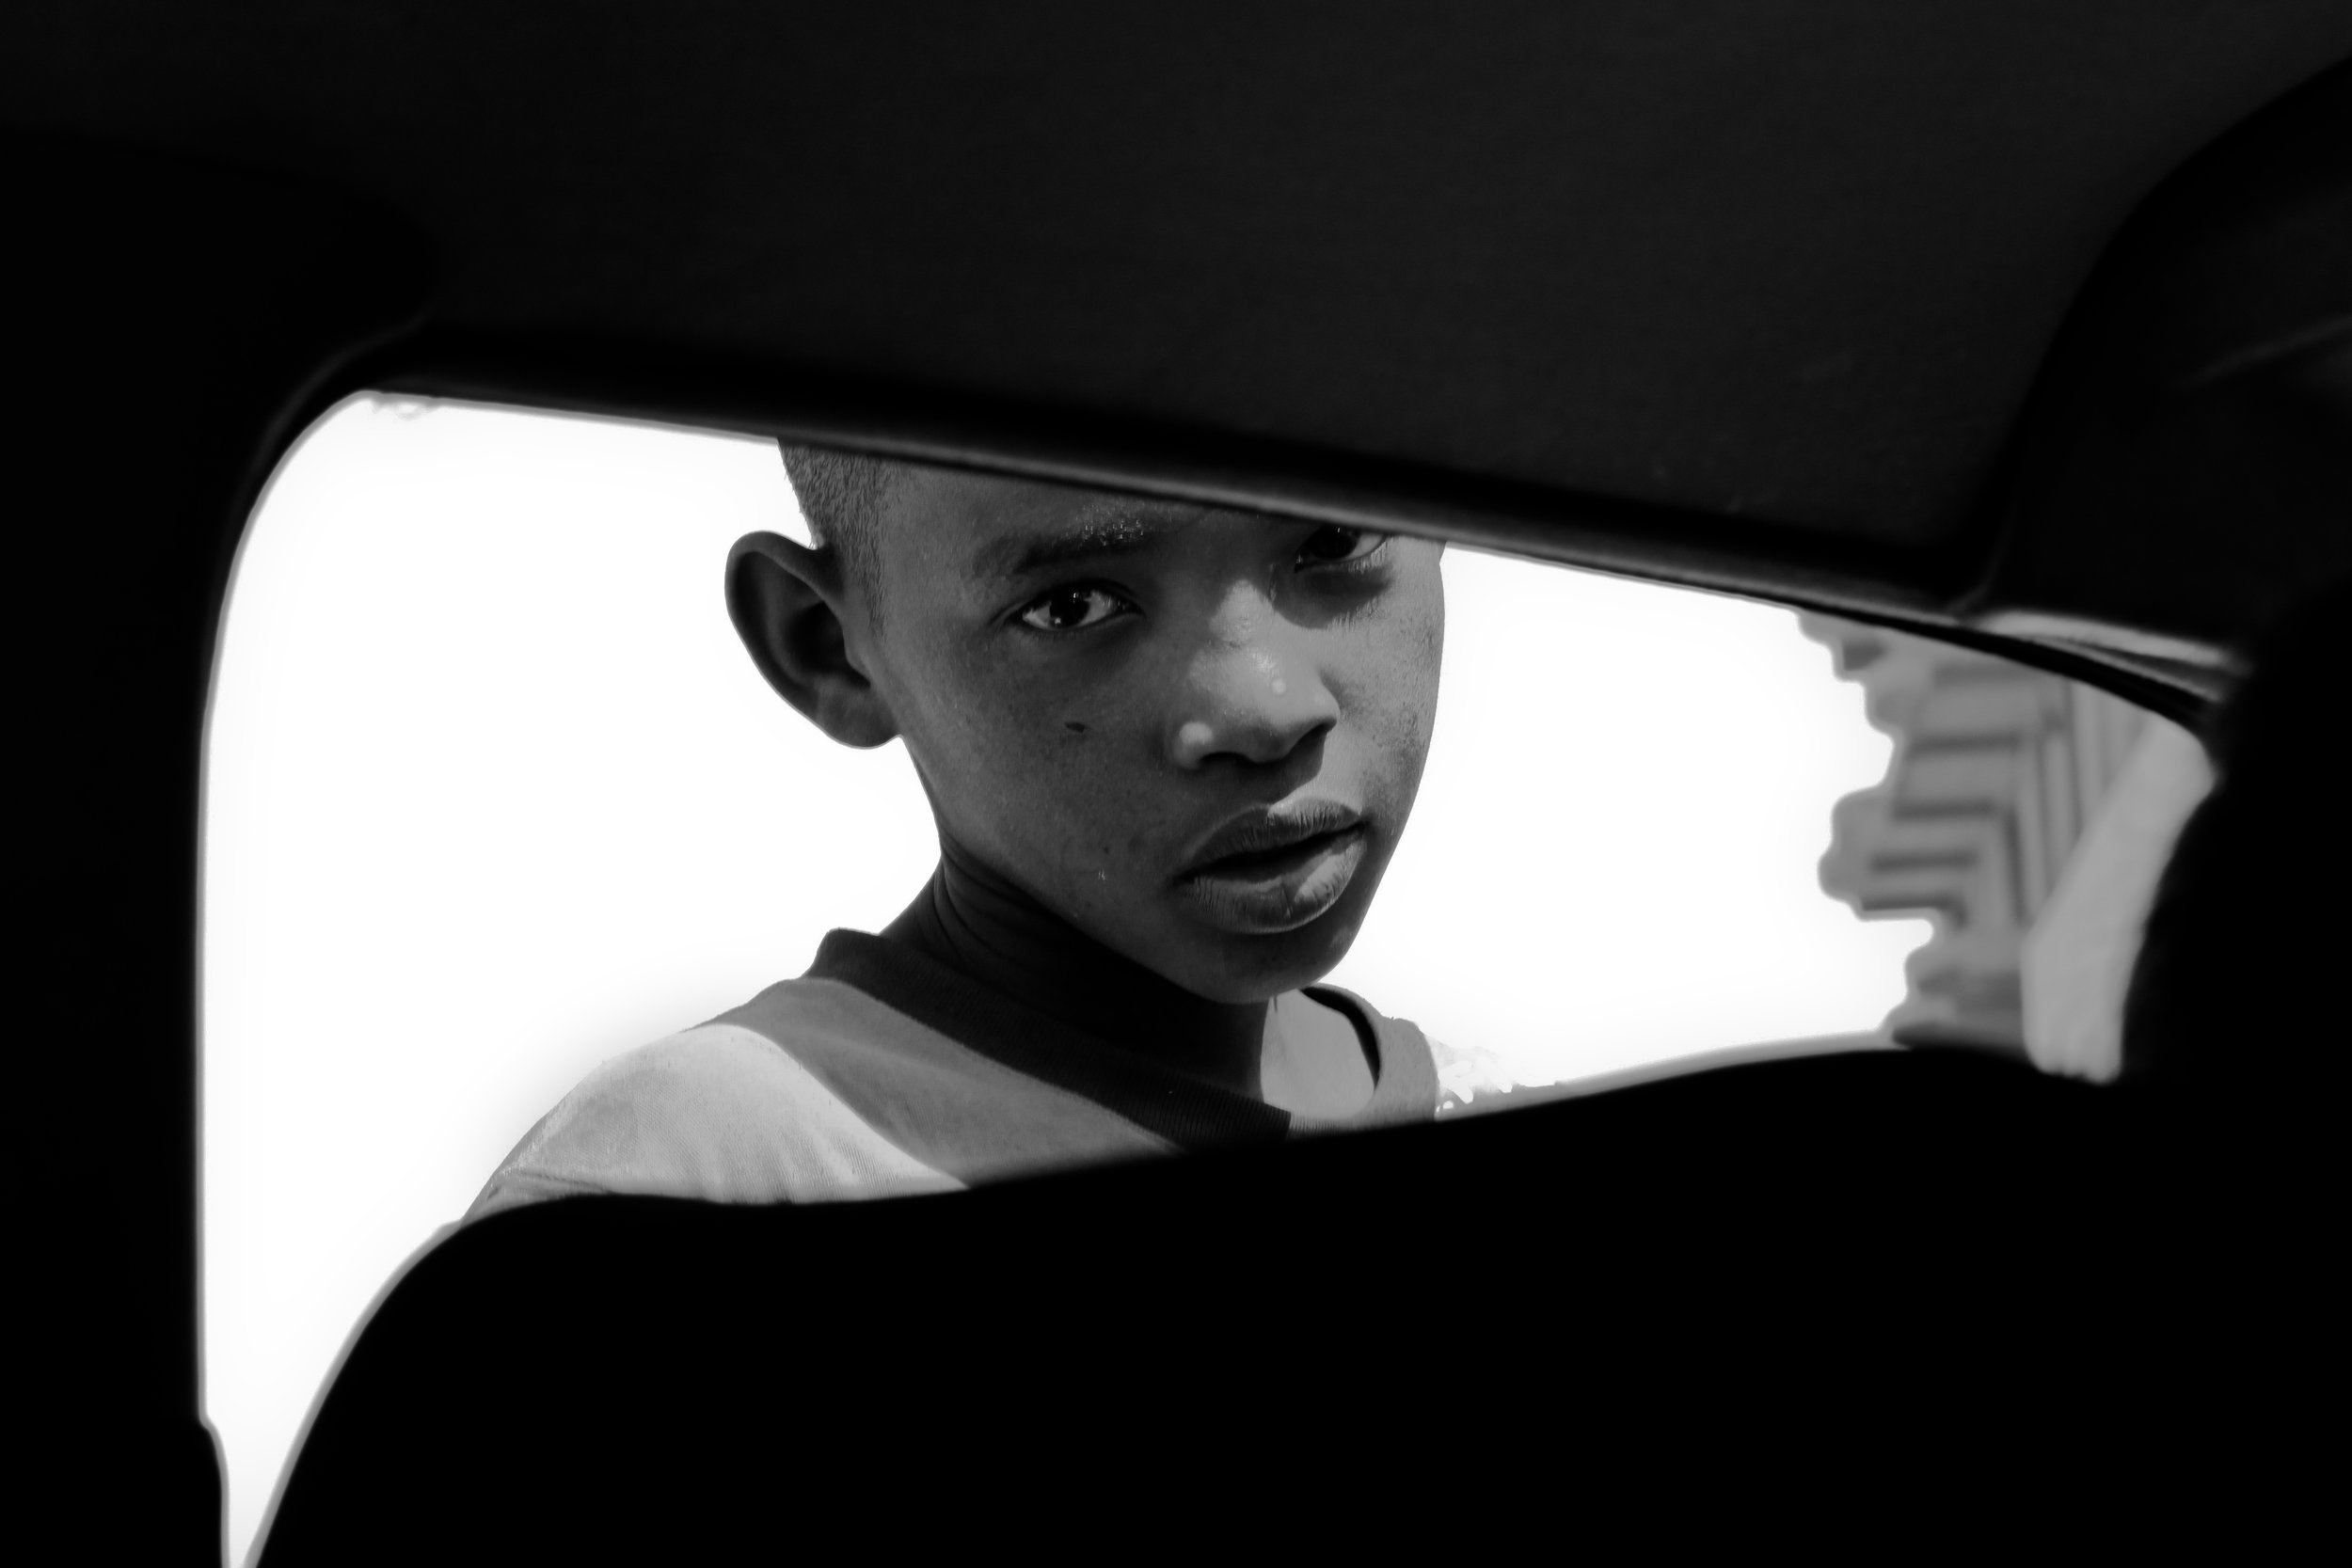 Ffotogallery Platform Instagram Takeover by Geraint Rowland - West African candid portrait.